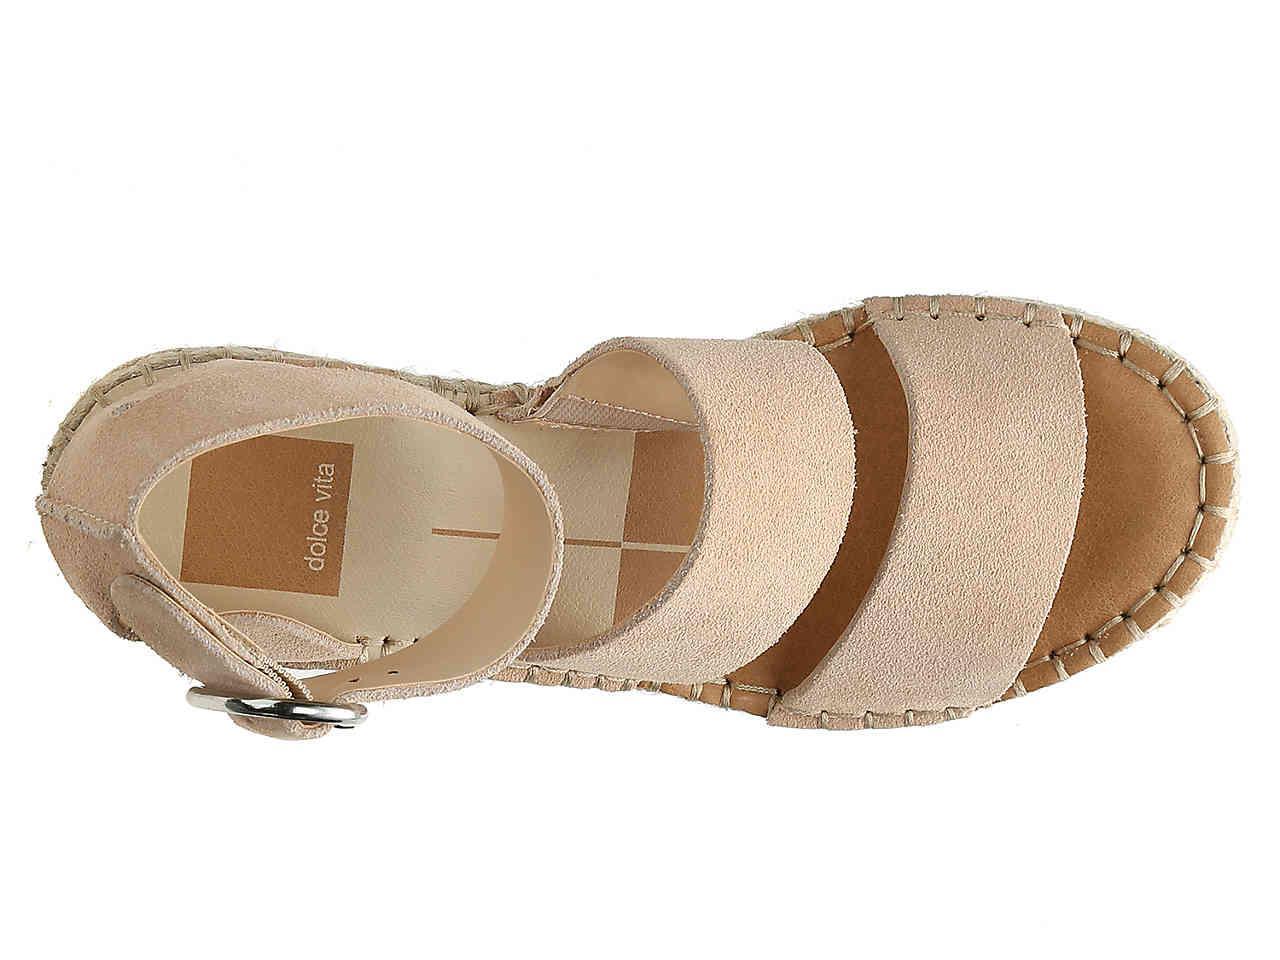 d9422c3c7f8 Dolce Vita - Natural Shae Espadrille Wedge Sandal - Lyst. View fullscreen